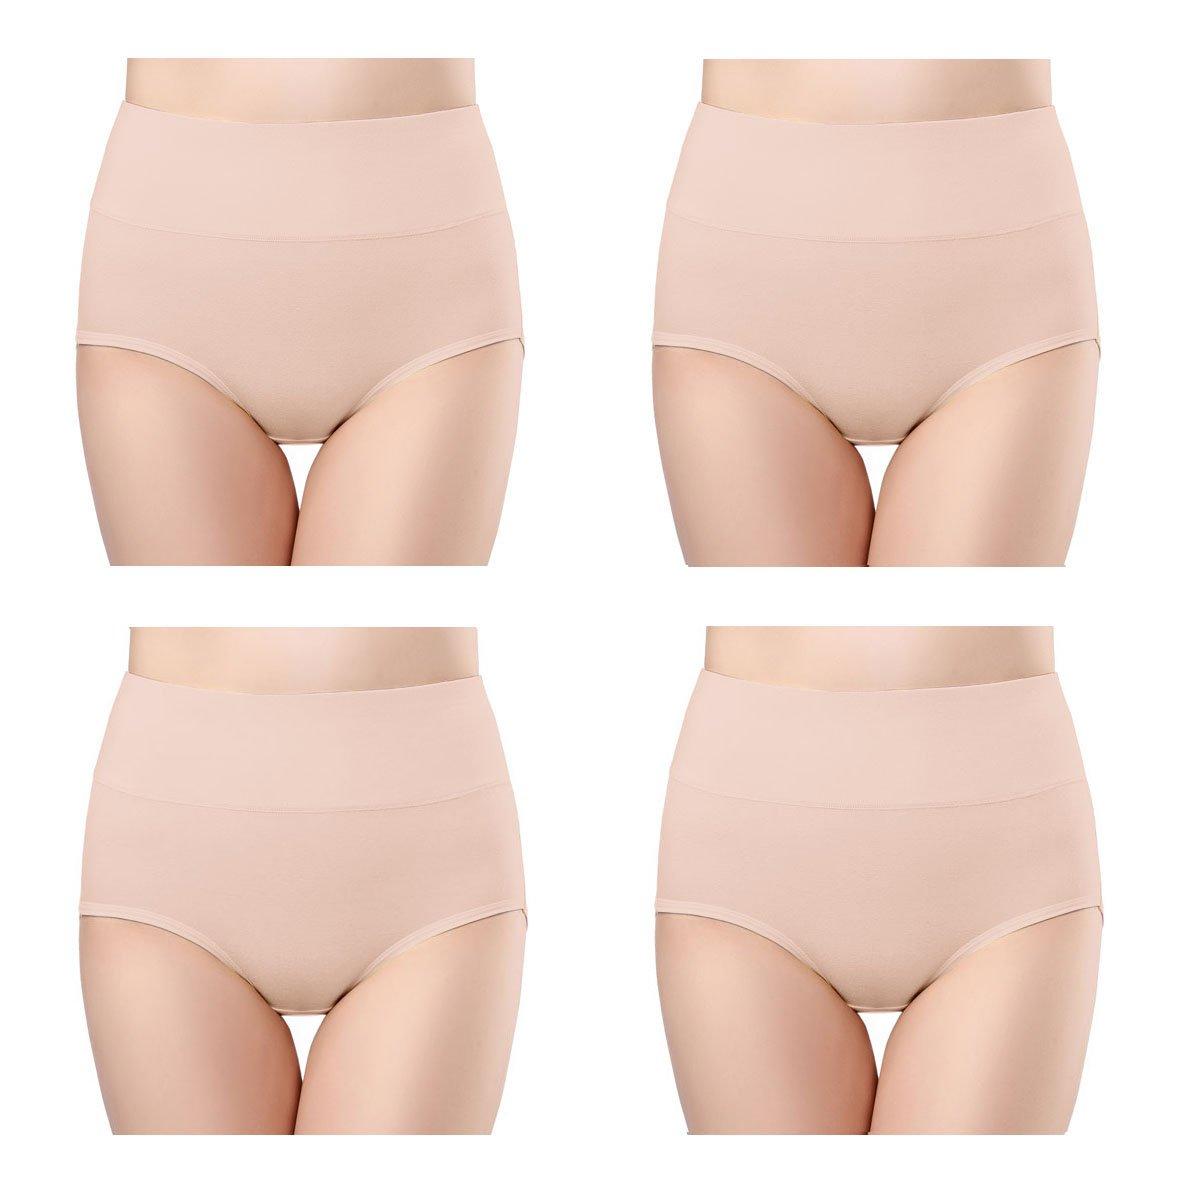 e3ab3cb7b452 wirarpa Womens Cotton Stretch Underwear 4 Pack High Waisted Briefs  Postpartum No Muffin Top Ladies Plus Size Underpants Beige, Size 9